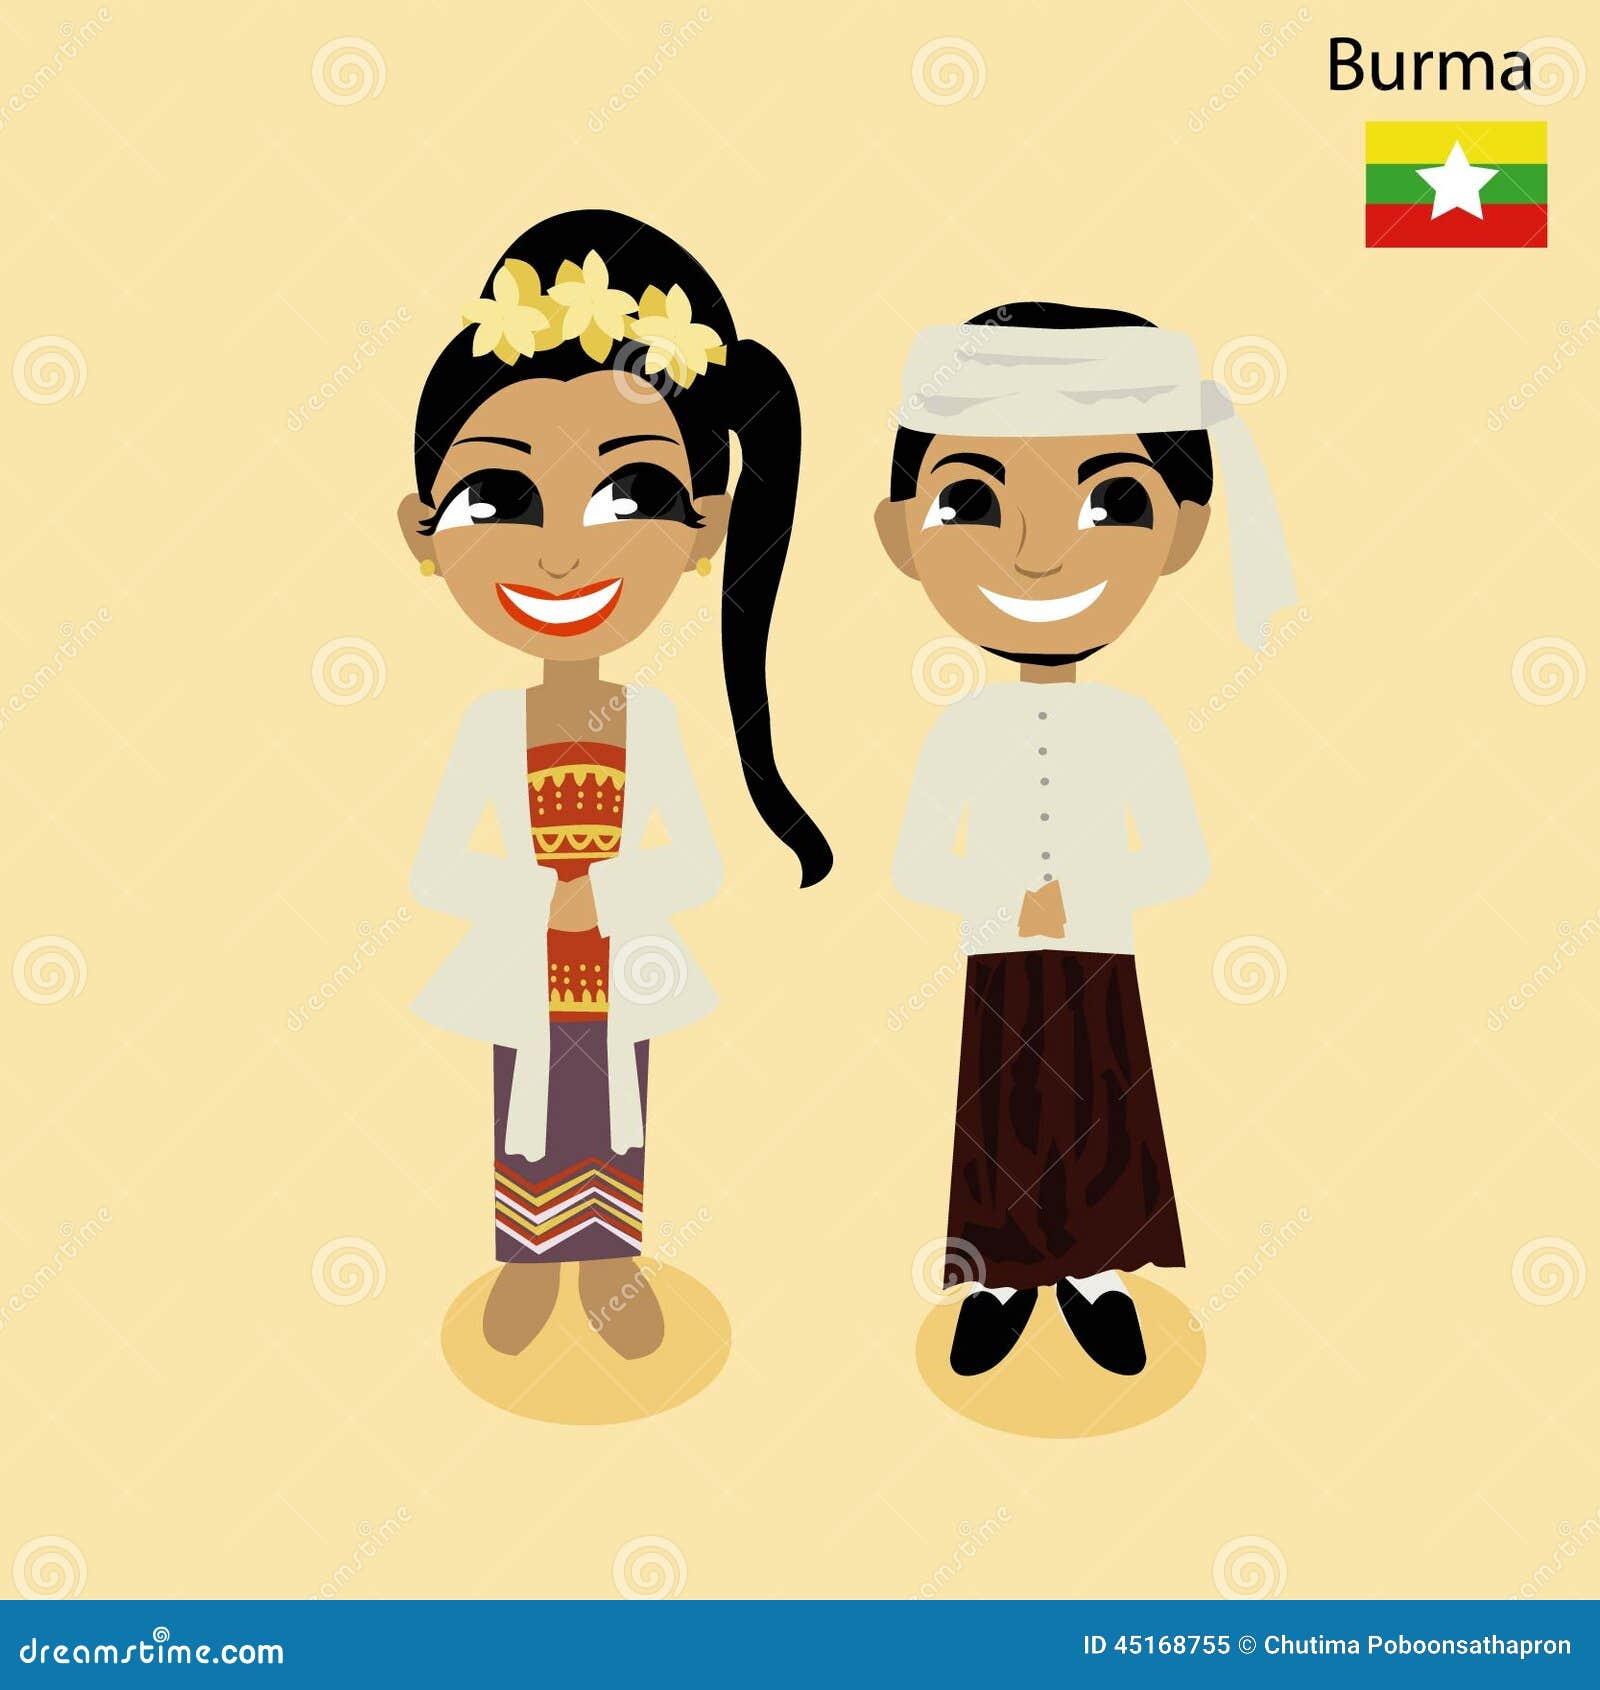 Cartoon ASEAN Burma Stock Vector - Image: 45168755